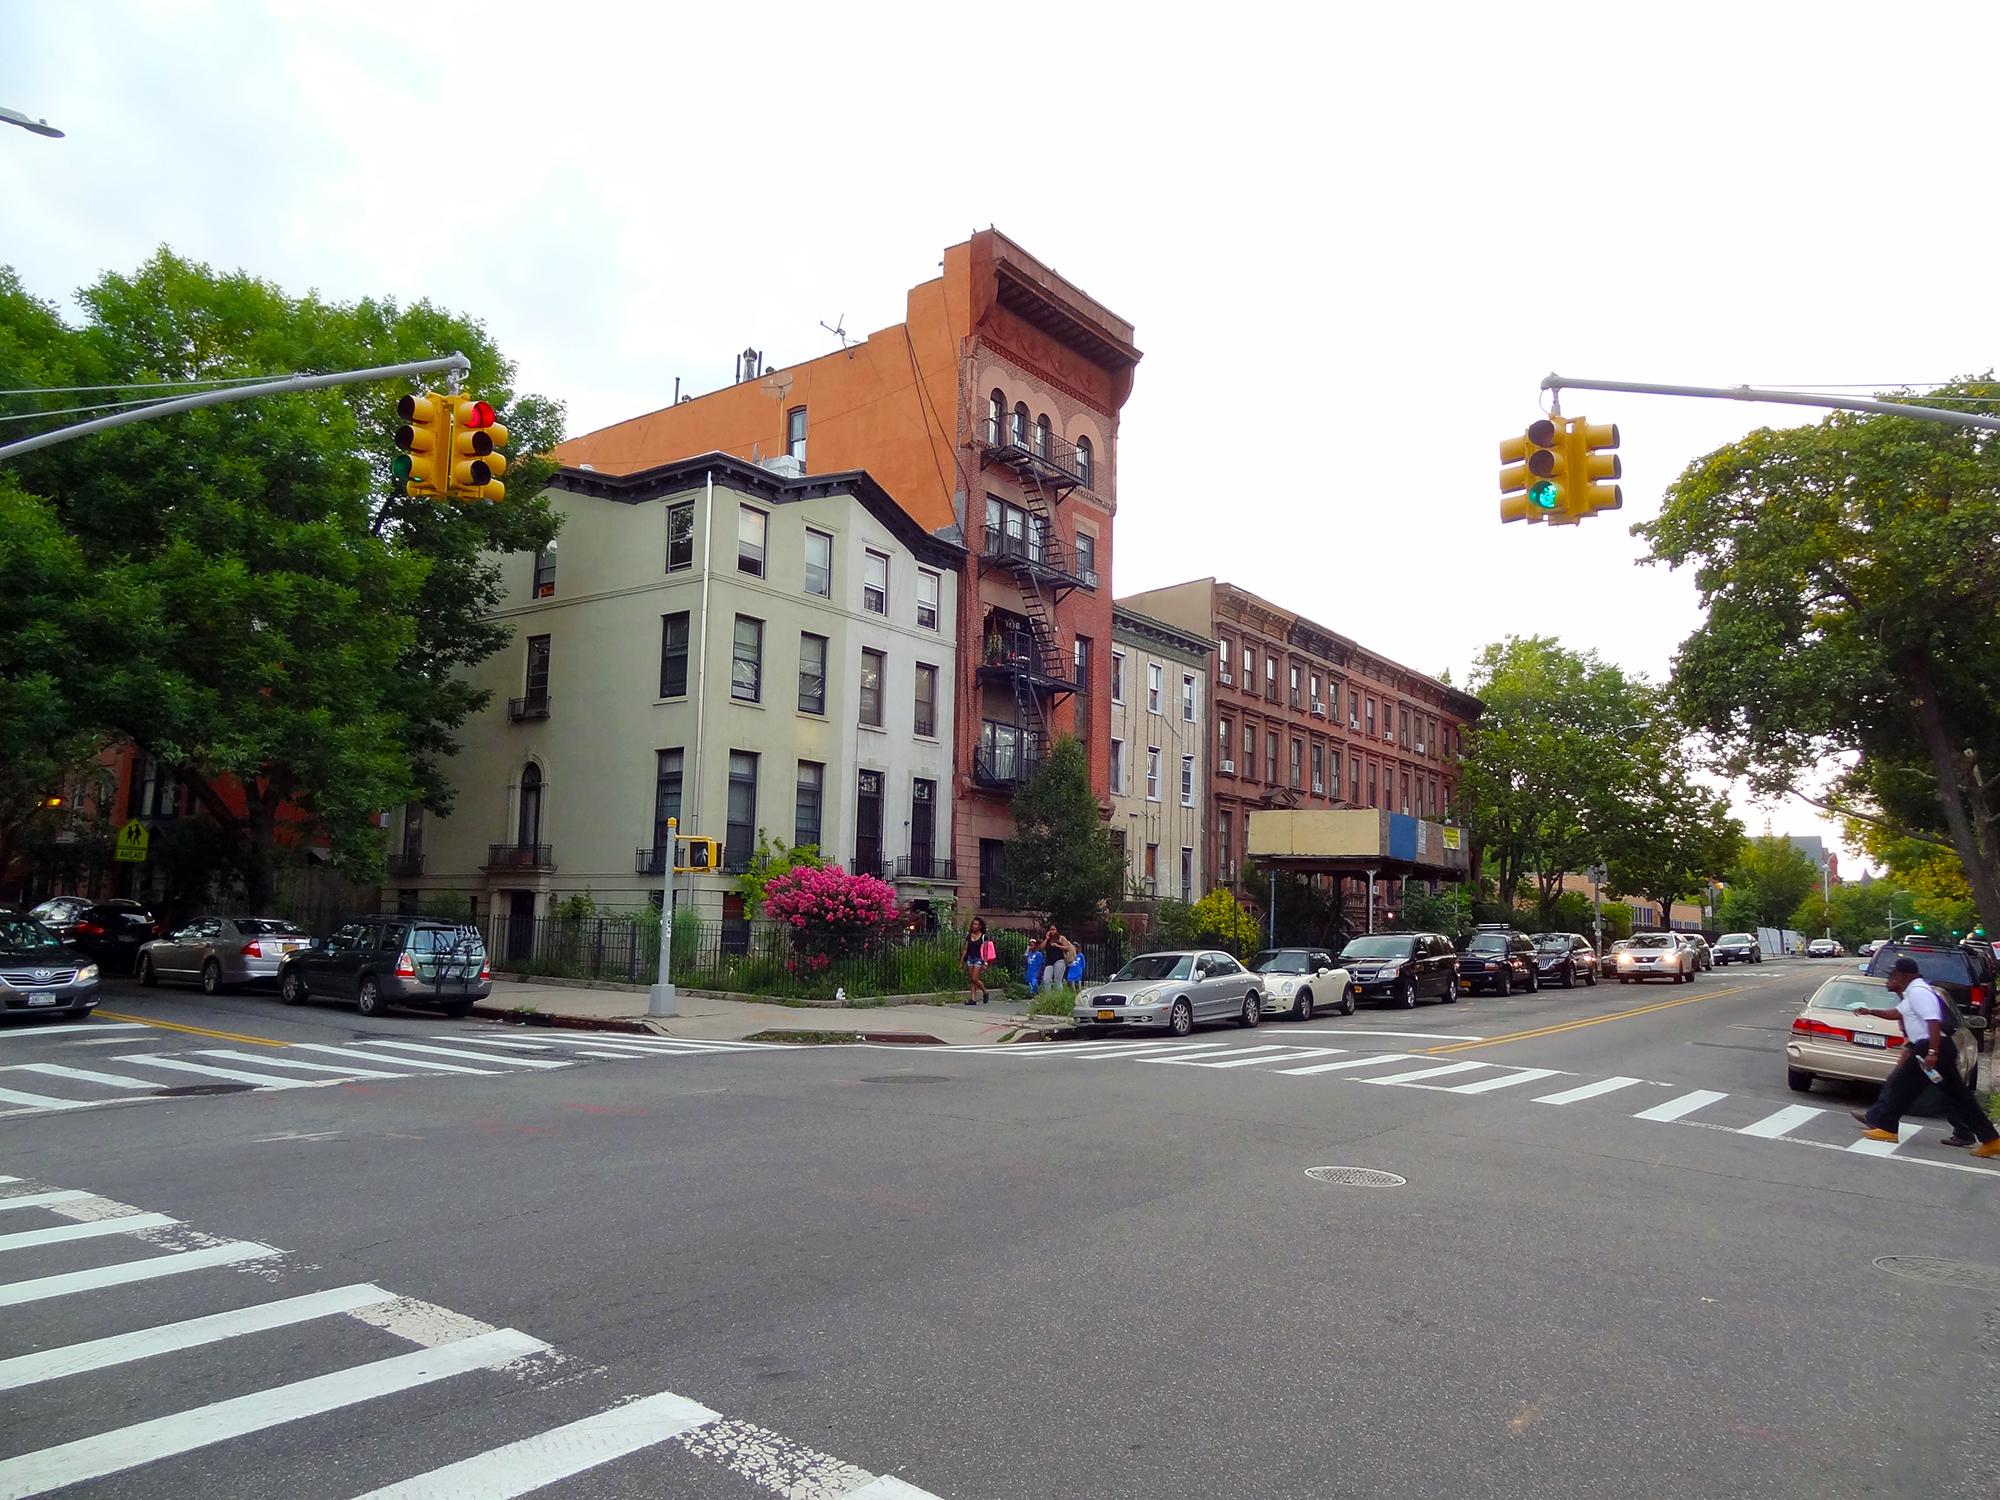 476 Washington Avenue, existing conditions